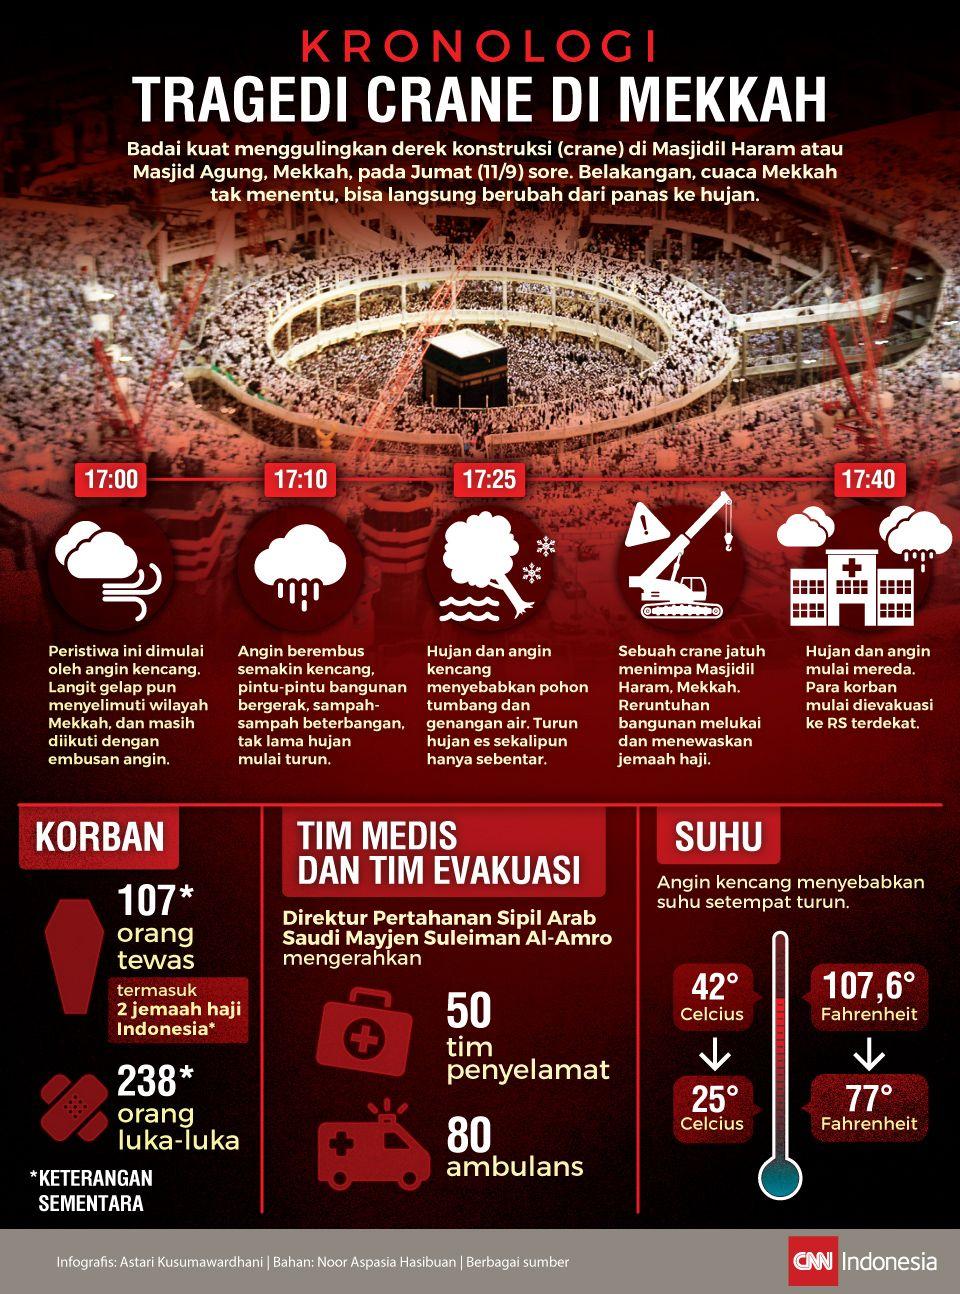 Kronologi Tragedi Crane di Mekkah